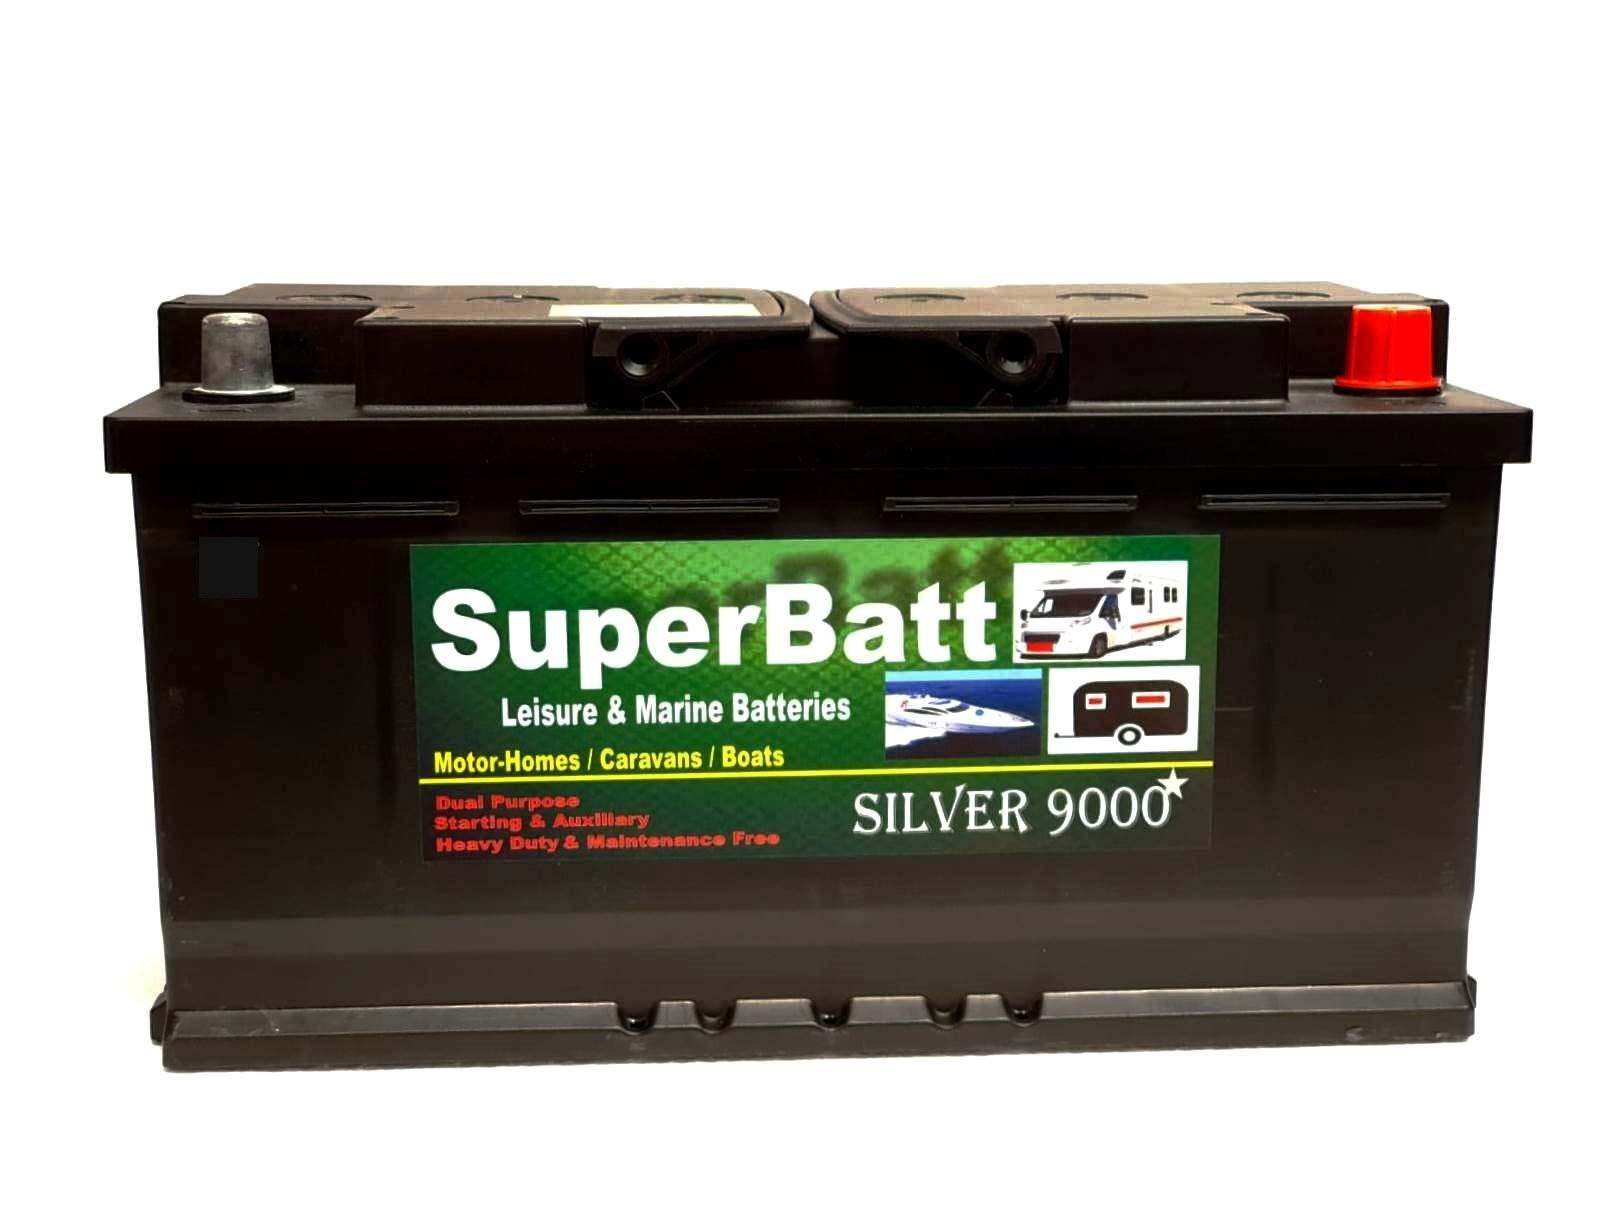 SuperBatt AGM1100 12V 120AH (100AH & 110AH) Heavy Duty Ultra Deep Cycle VRLA AGM Leisure Marine Battery - SAFE & SPILL PROOF - Caravan Motorhome Boat Motor Mover